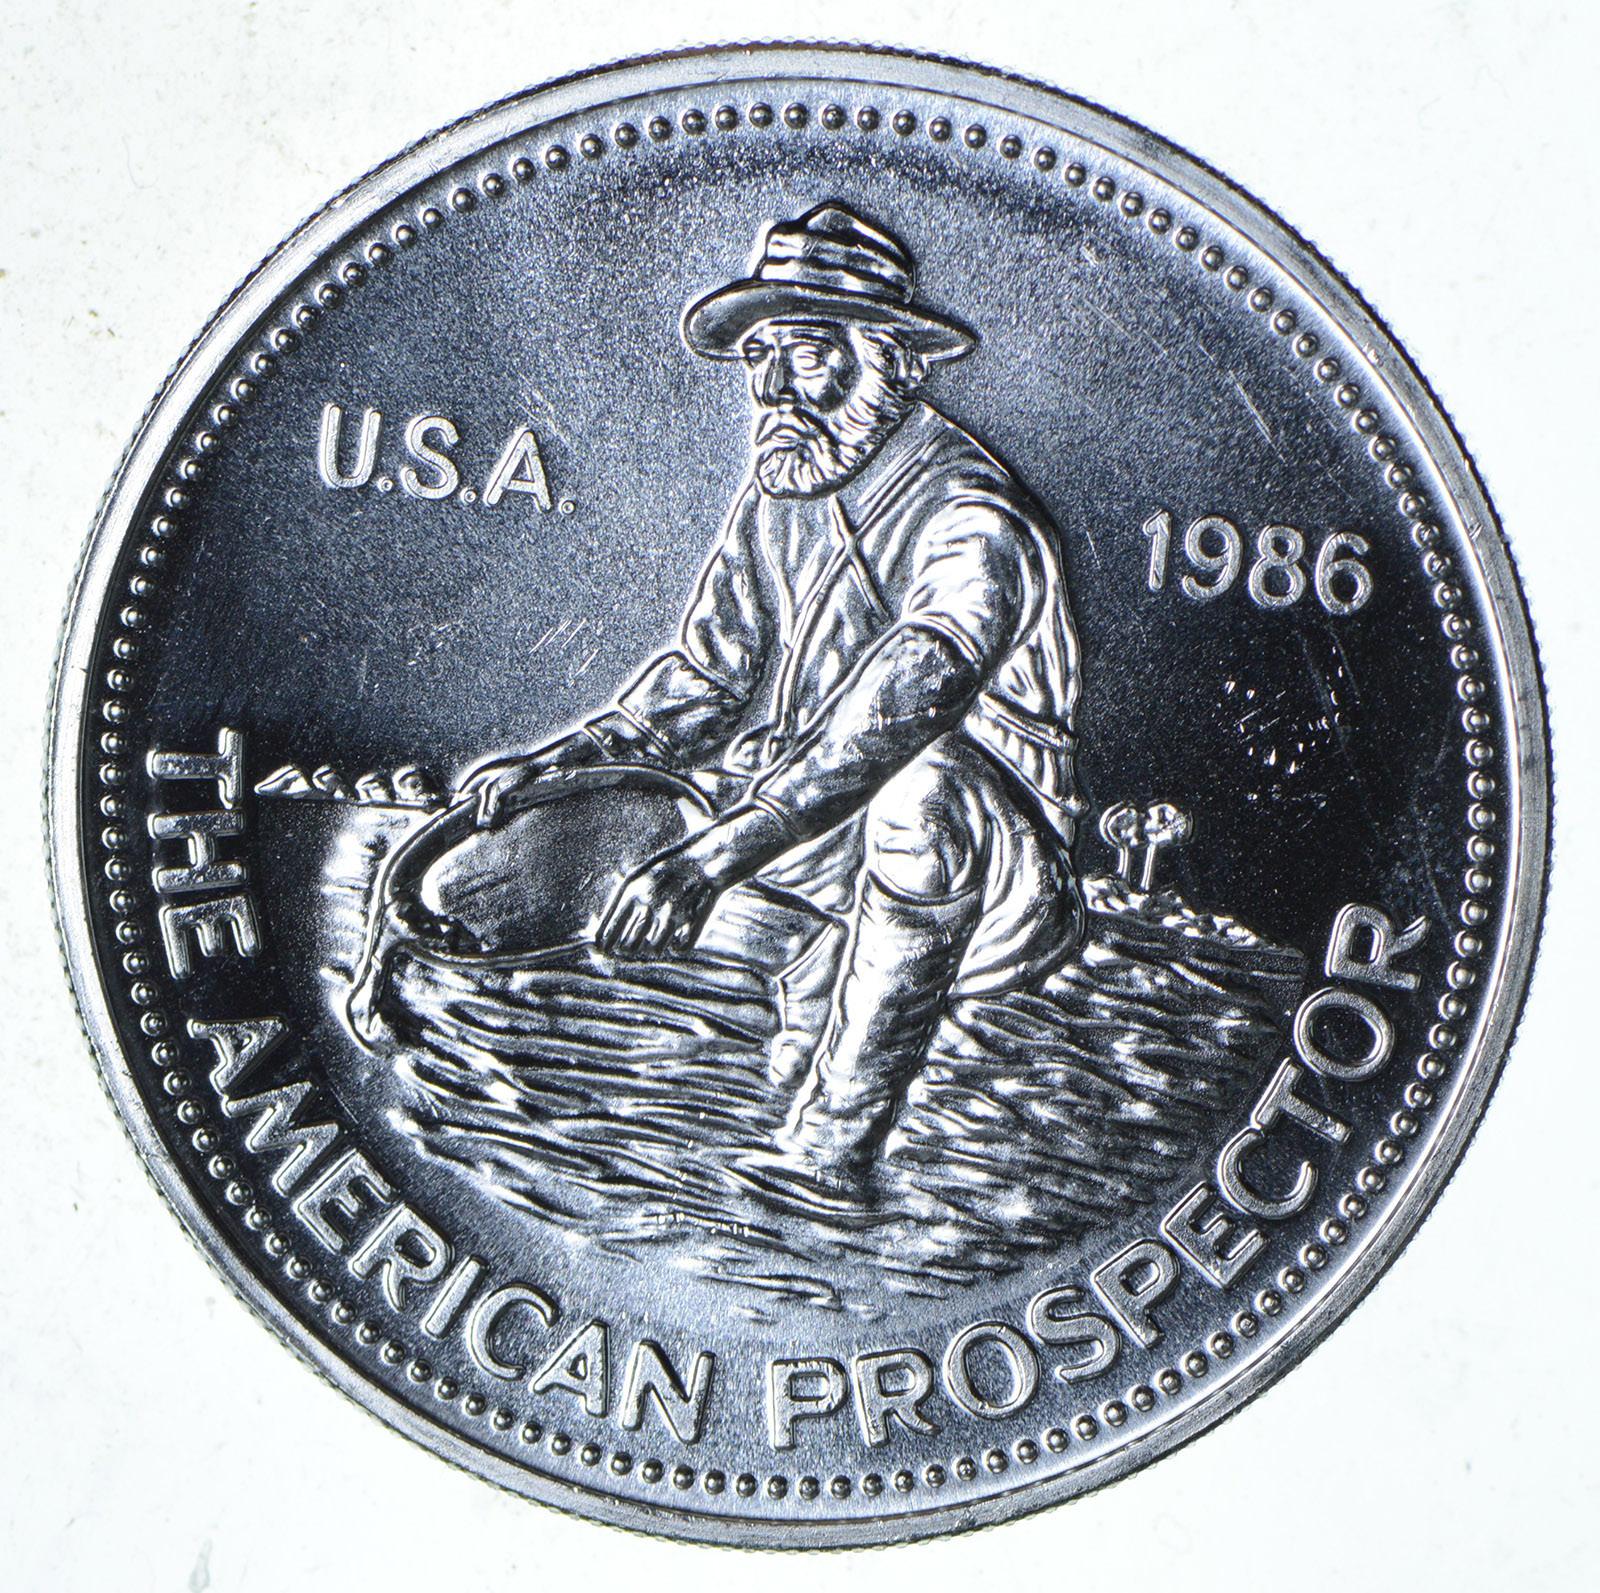 1 GRAM .999 PURE SILVER AMERICAN PROSPECTOR ROUNDS 100